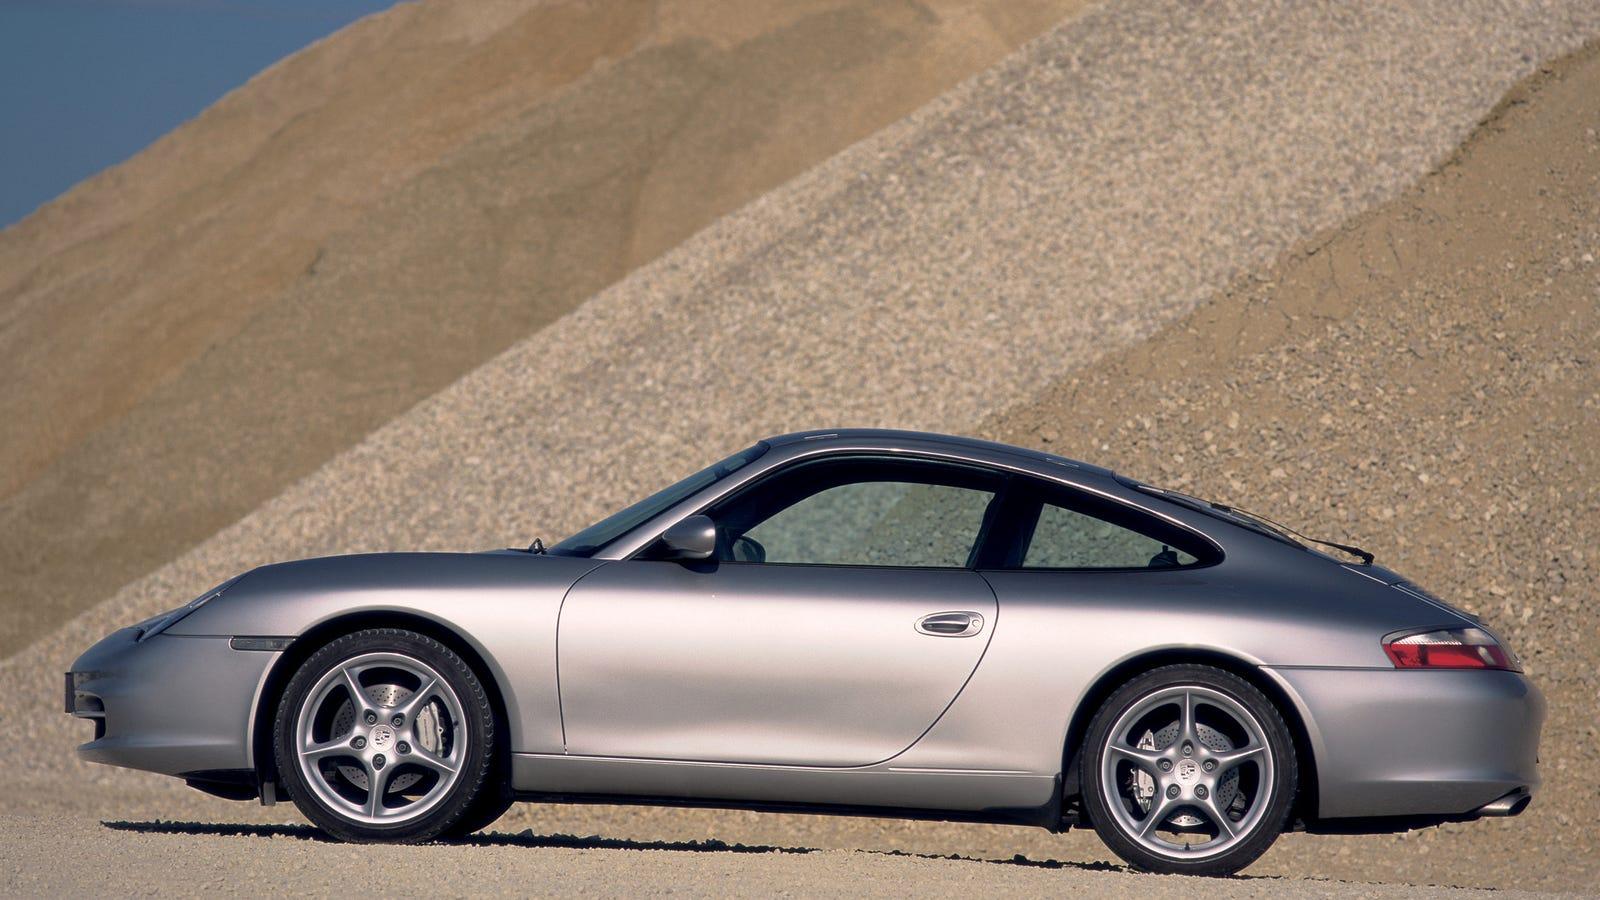 Best Way To Buy Used Cars Jalopnik